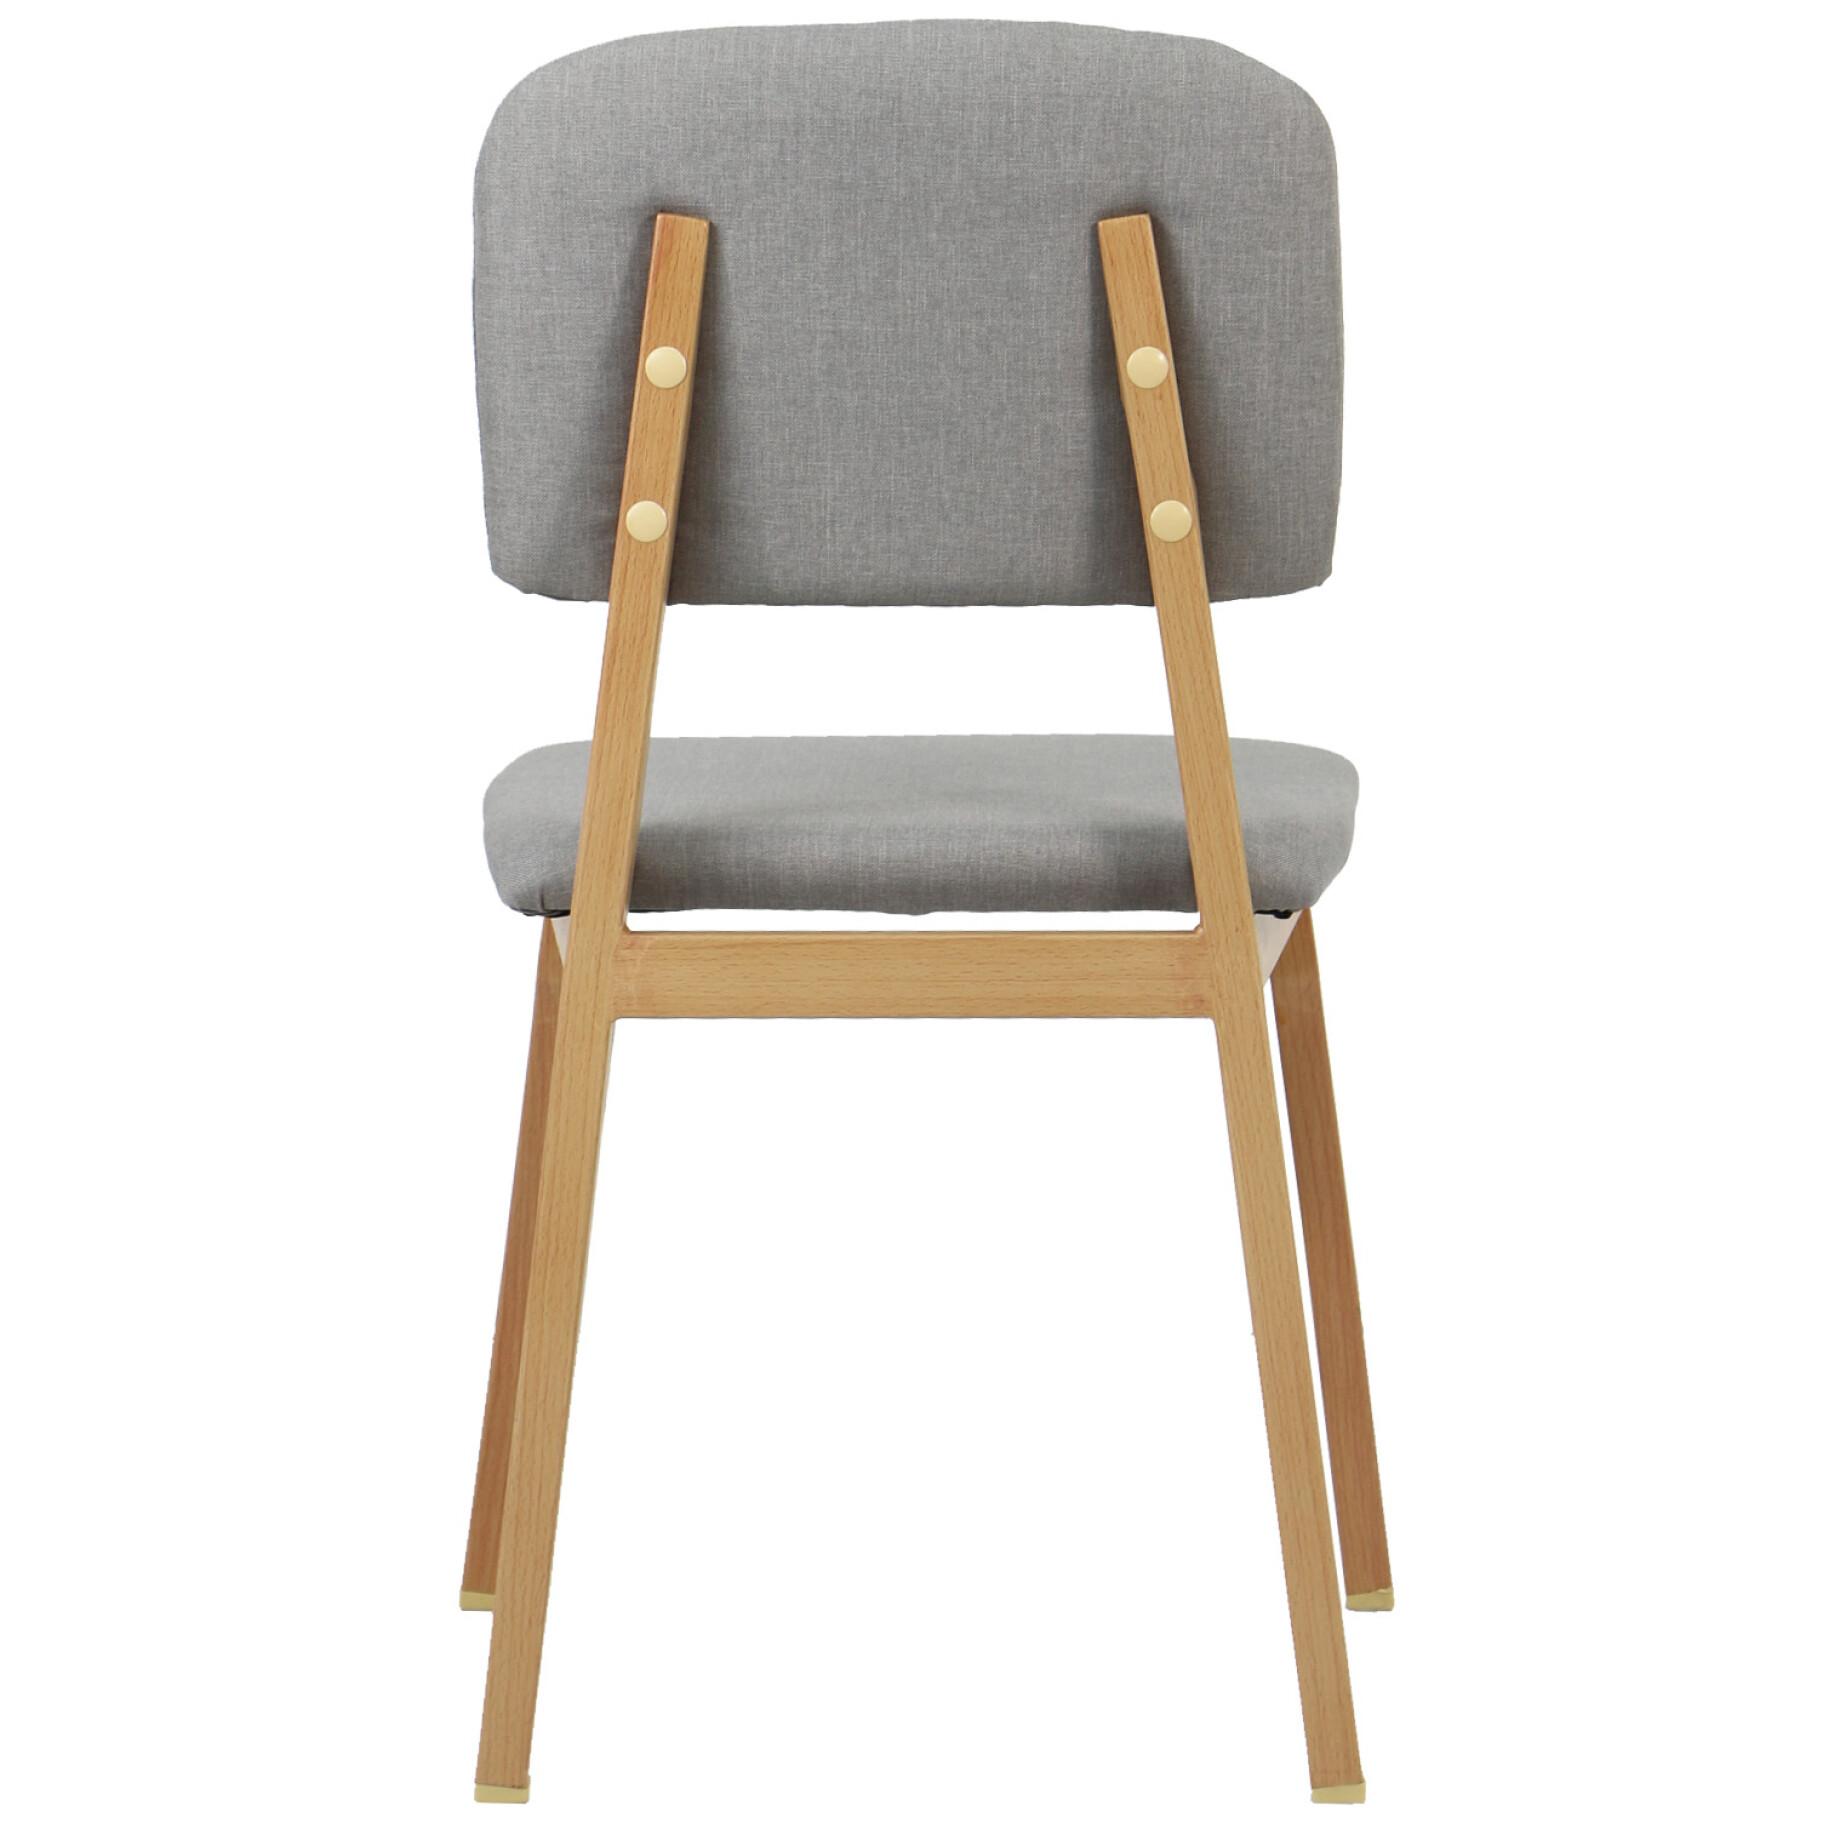 light grey chair ergonomic folding chairs zeslier dining furniture home decor fortytwo regular price s 82 90